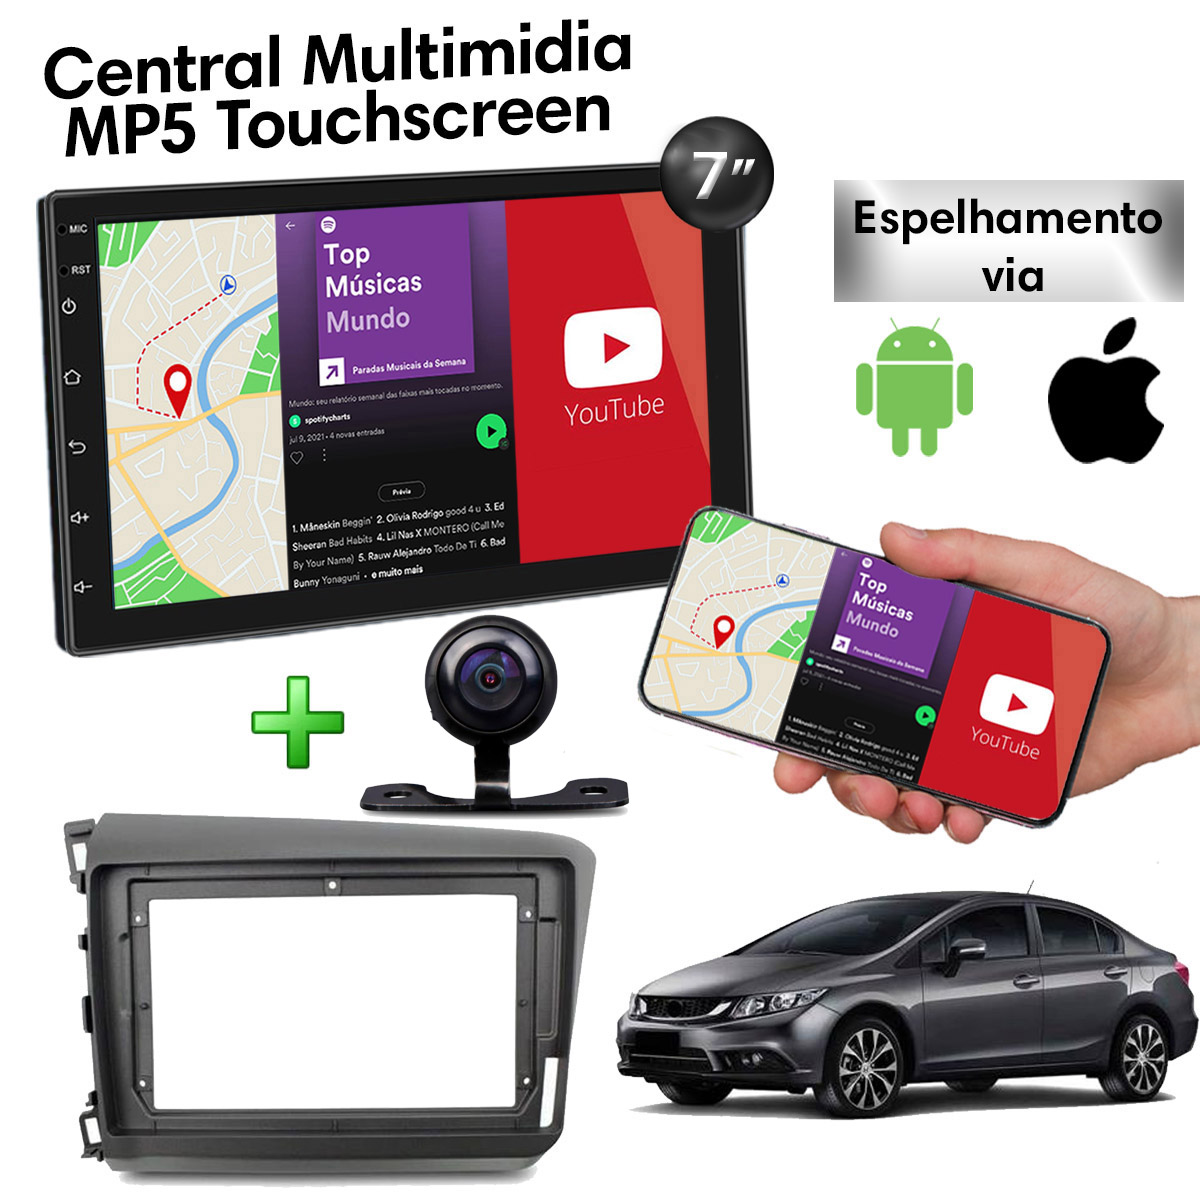 Central Multimídia com Moldura Honda Civic Mp5 Bluetooth Usb Touchscreen 7 Polegadas 2 Din 2012 a 2016 Poliparts